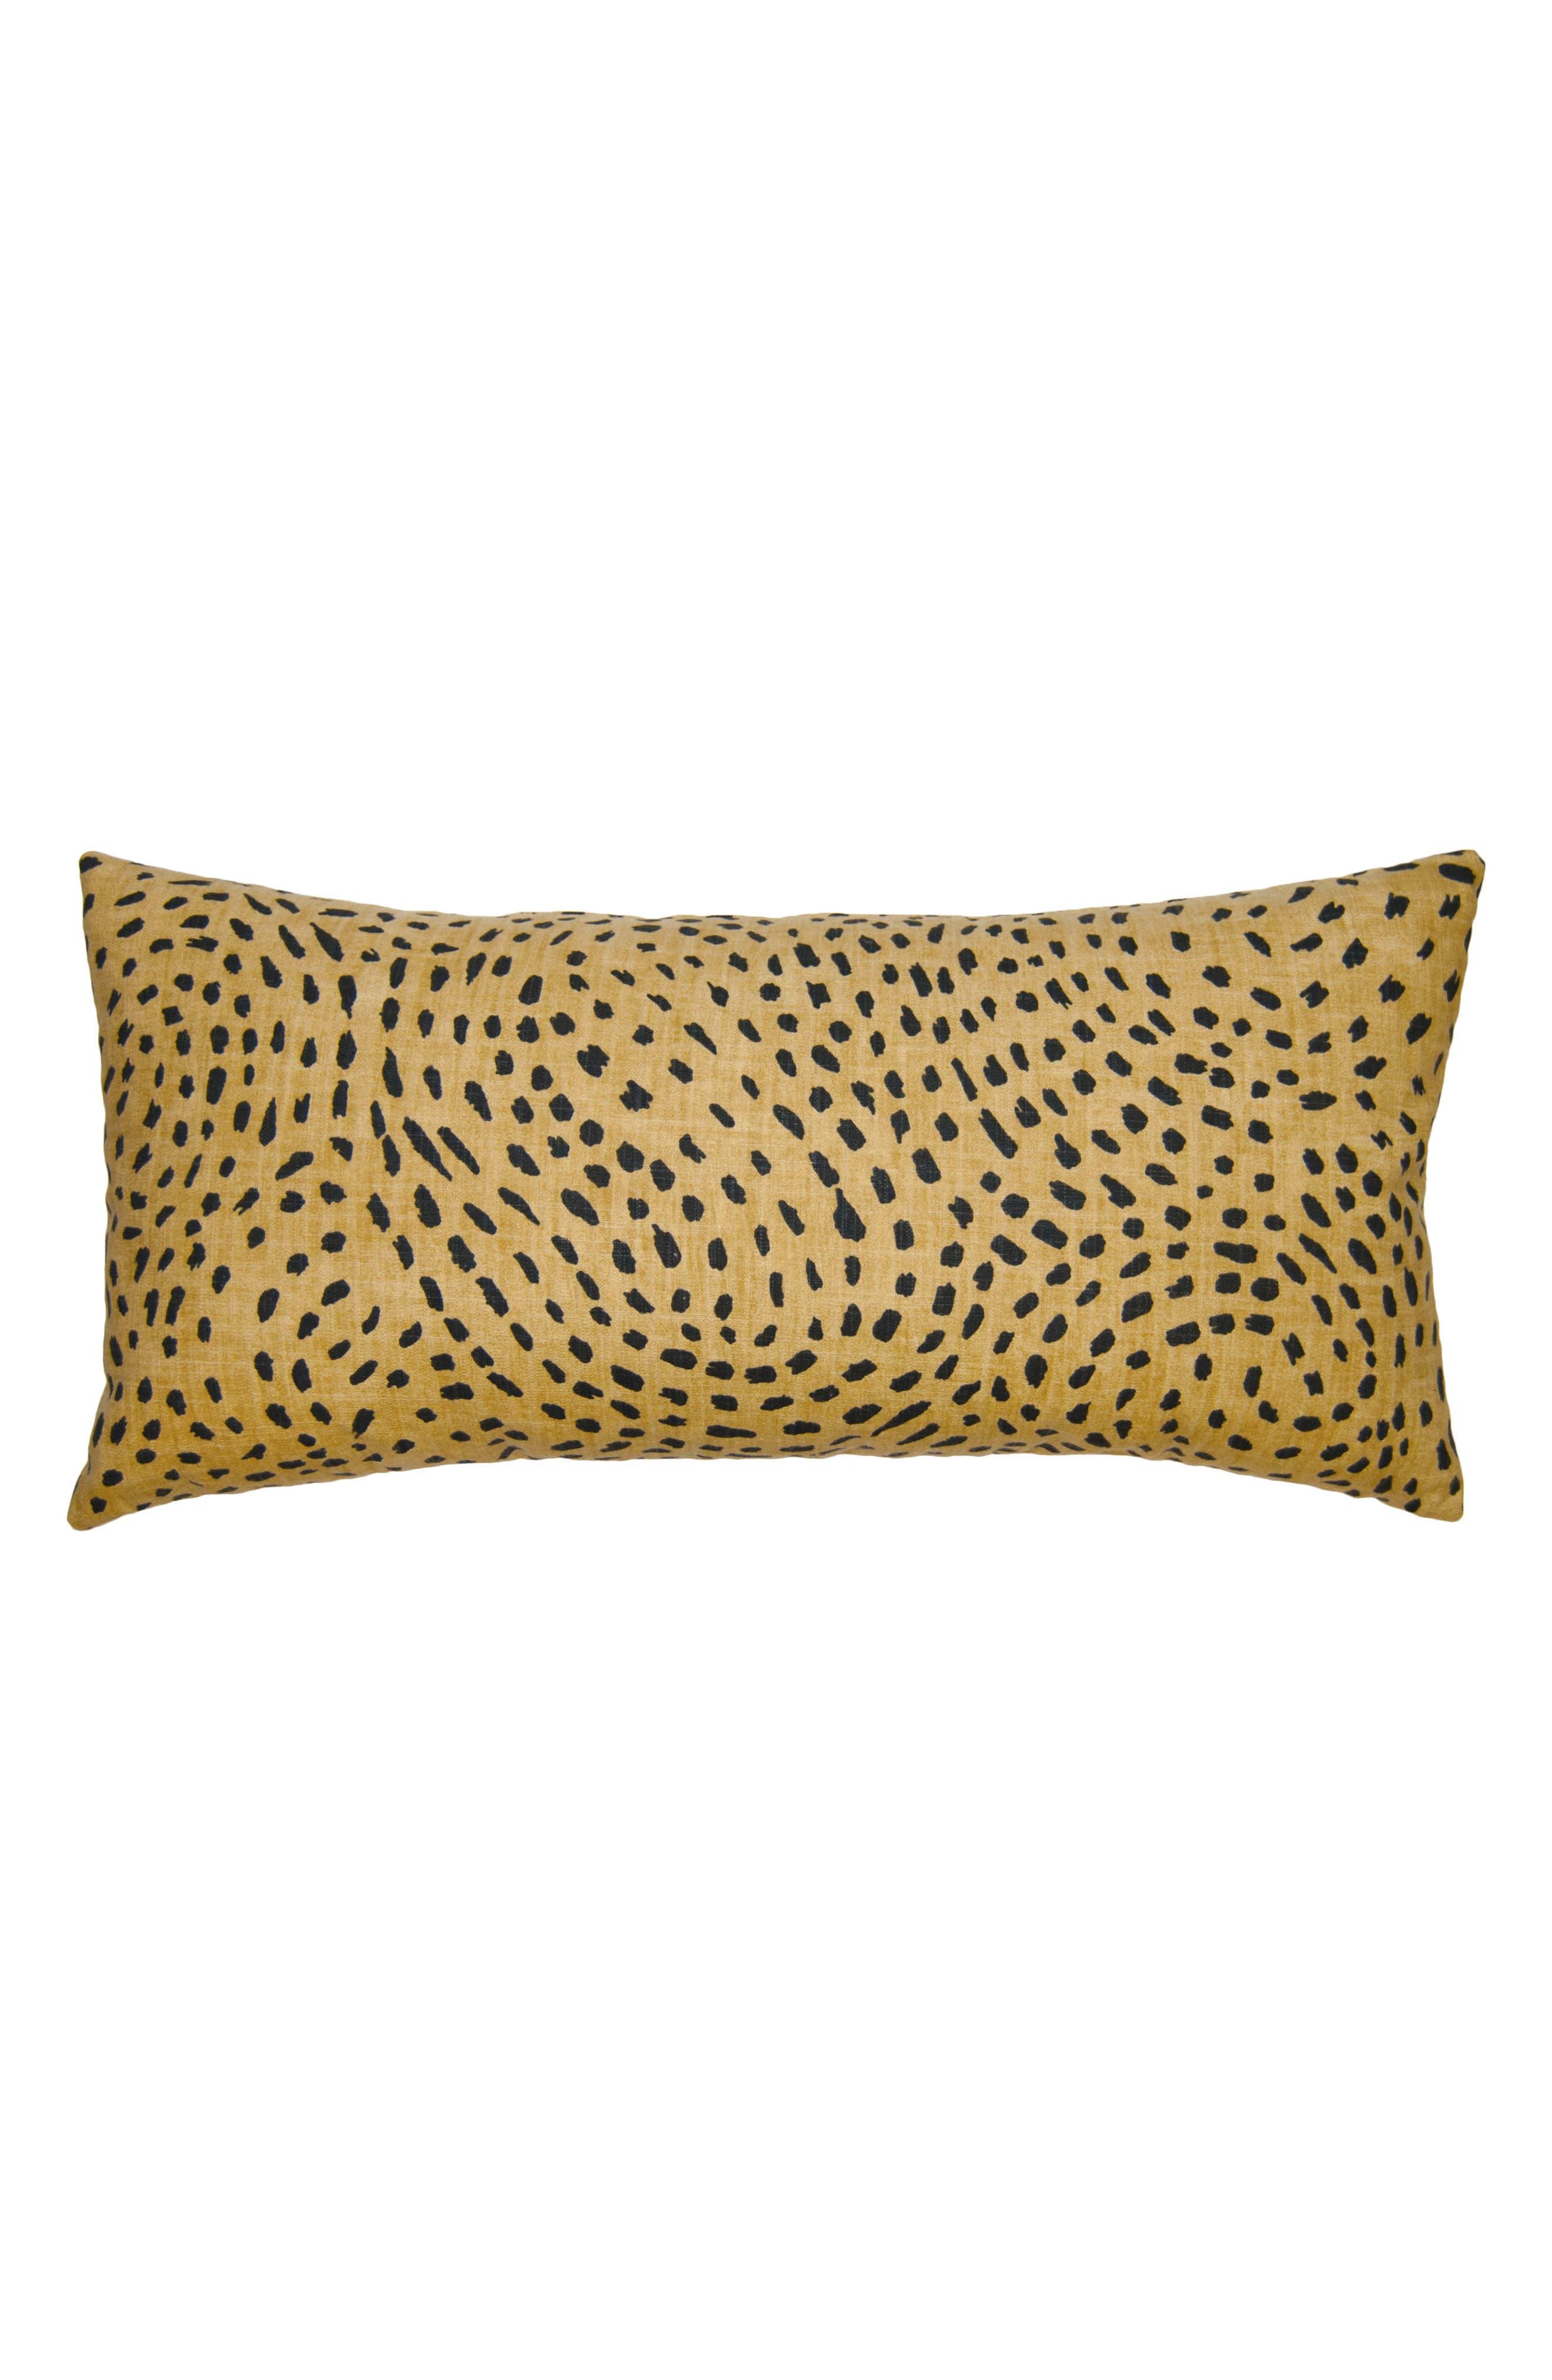 Kingdom Cheetah Accent Pillow,                         Main,                         color, Tan